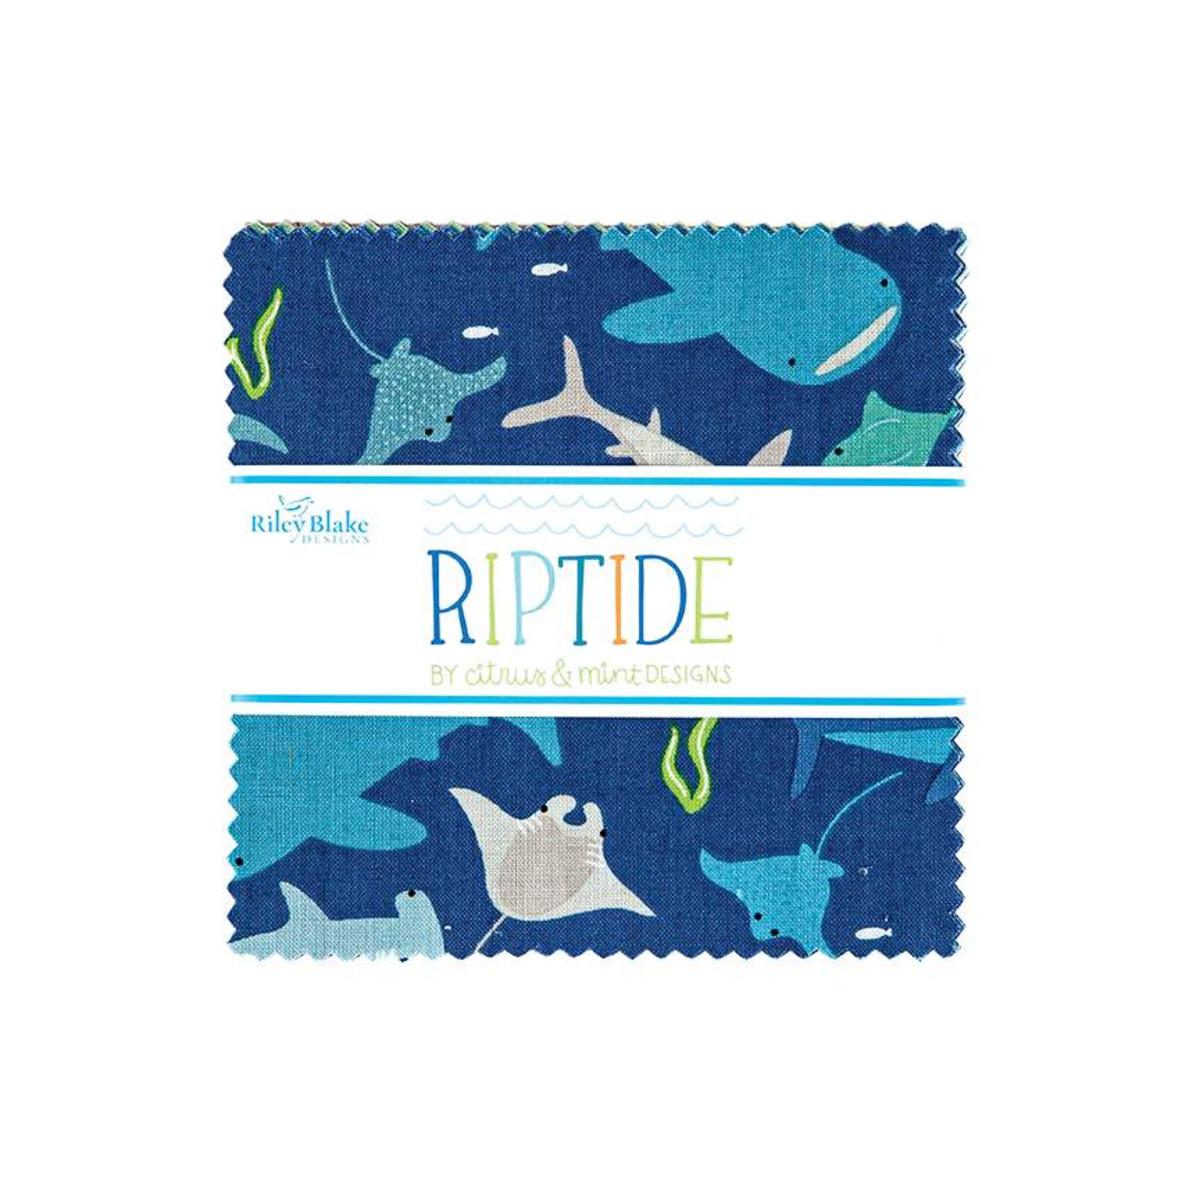 Riley Blake Charm Pack - Riptide by Citrus & Mint Designs